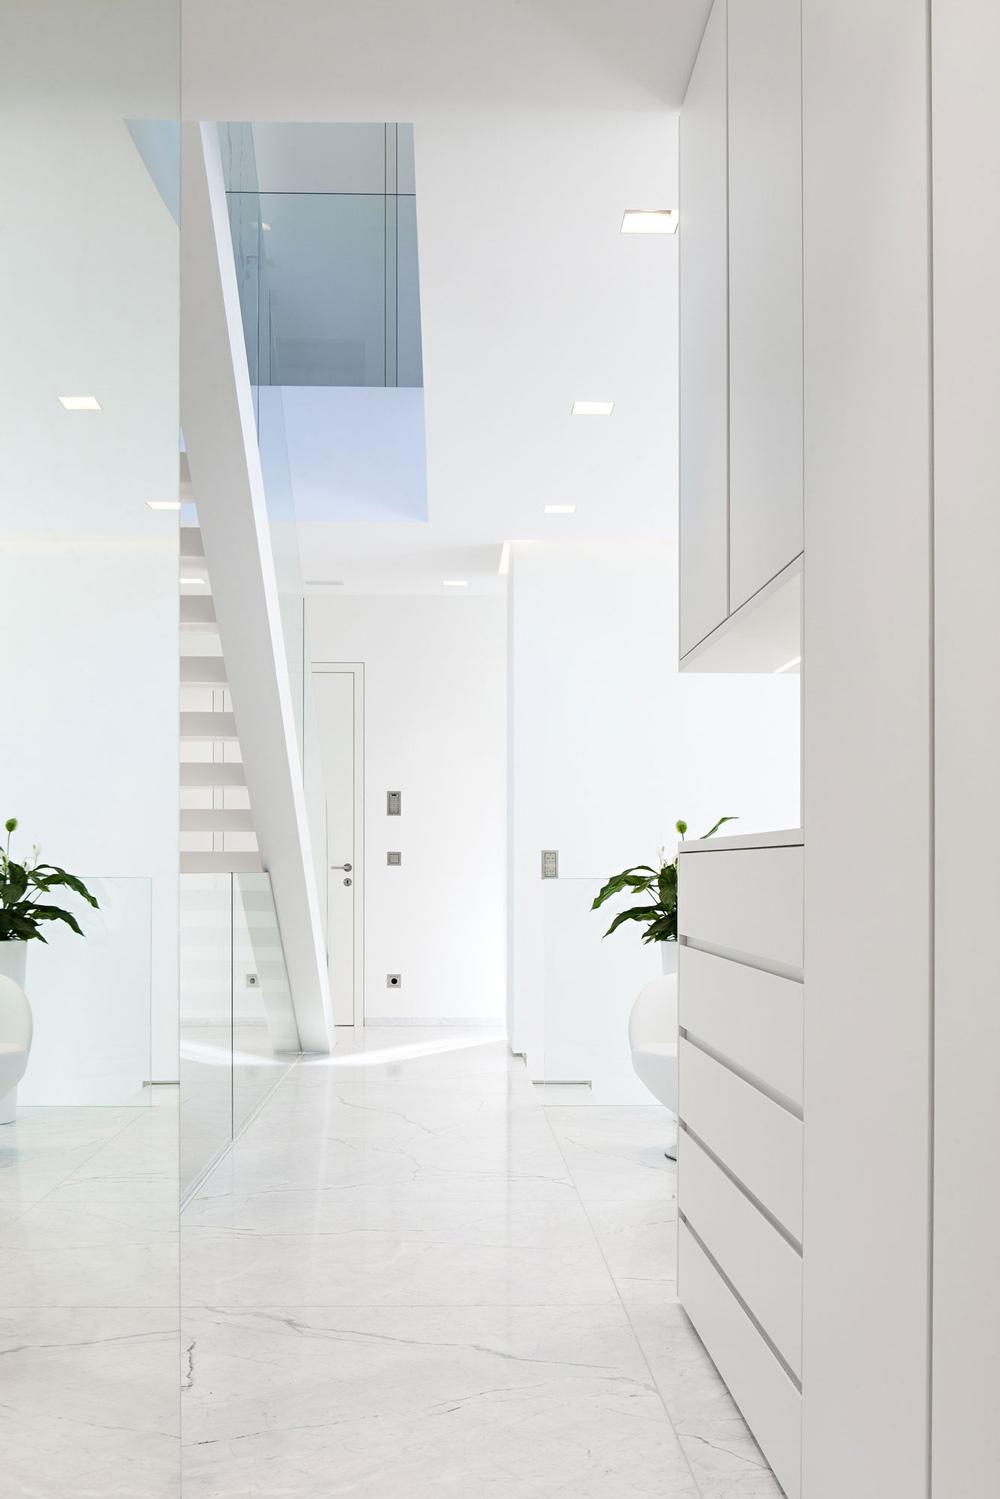 Bright Interior, House M in Meran, Italy by monovolume architecture + design